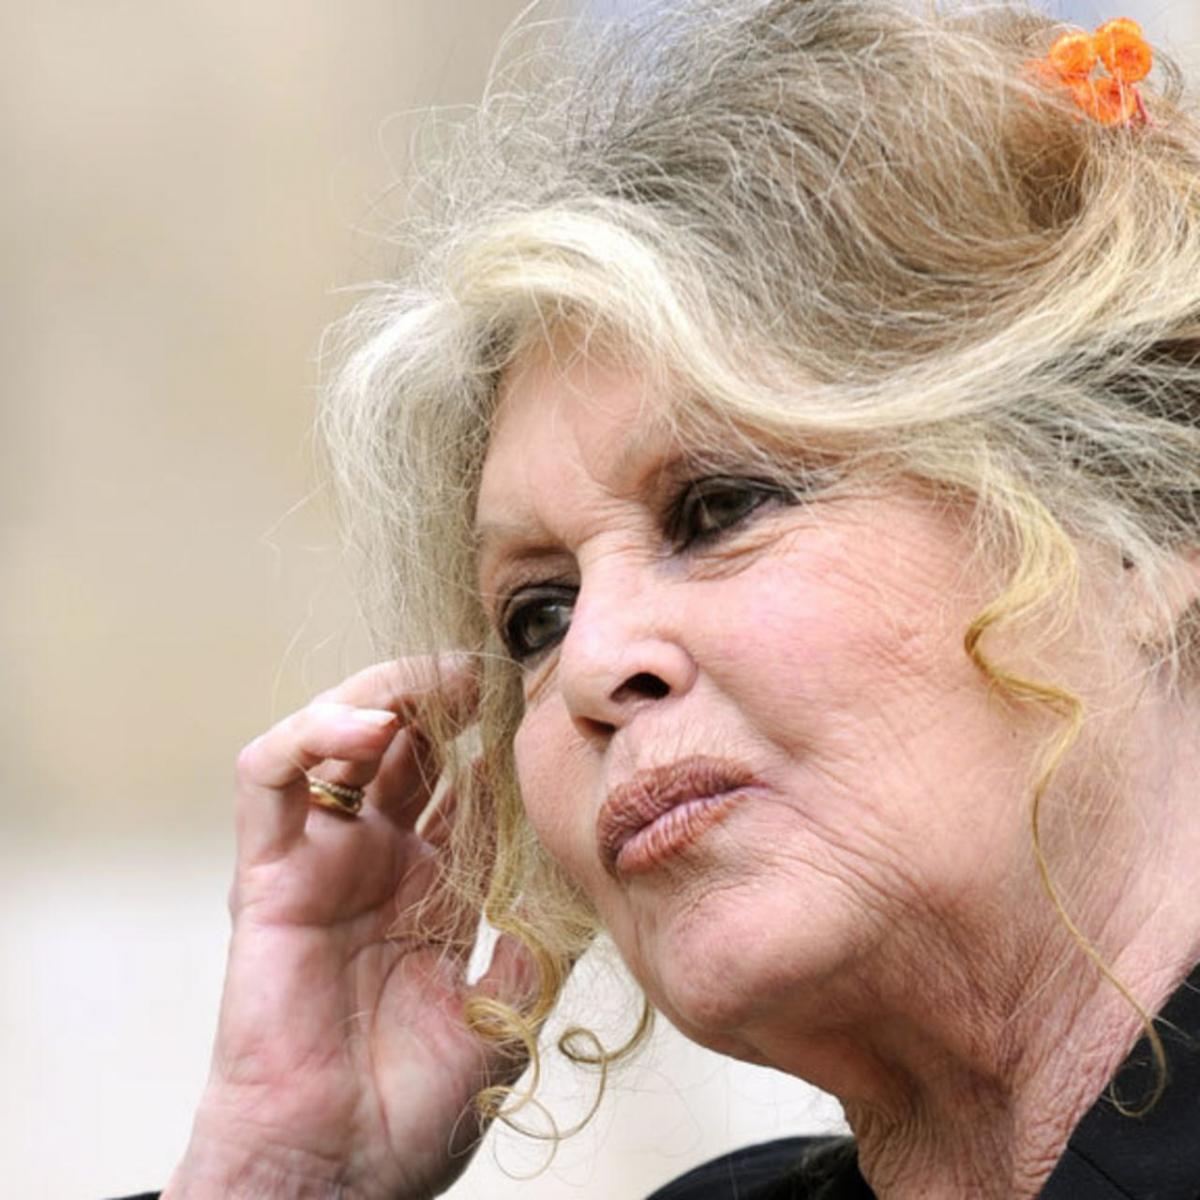 Injures à l'encontre de Willy Schraen : Brigitte Bardot condamnée